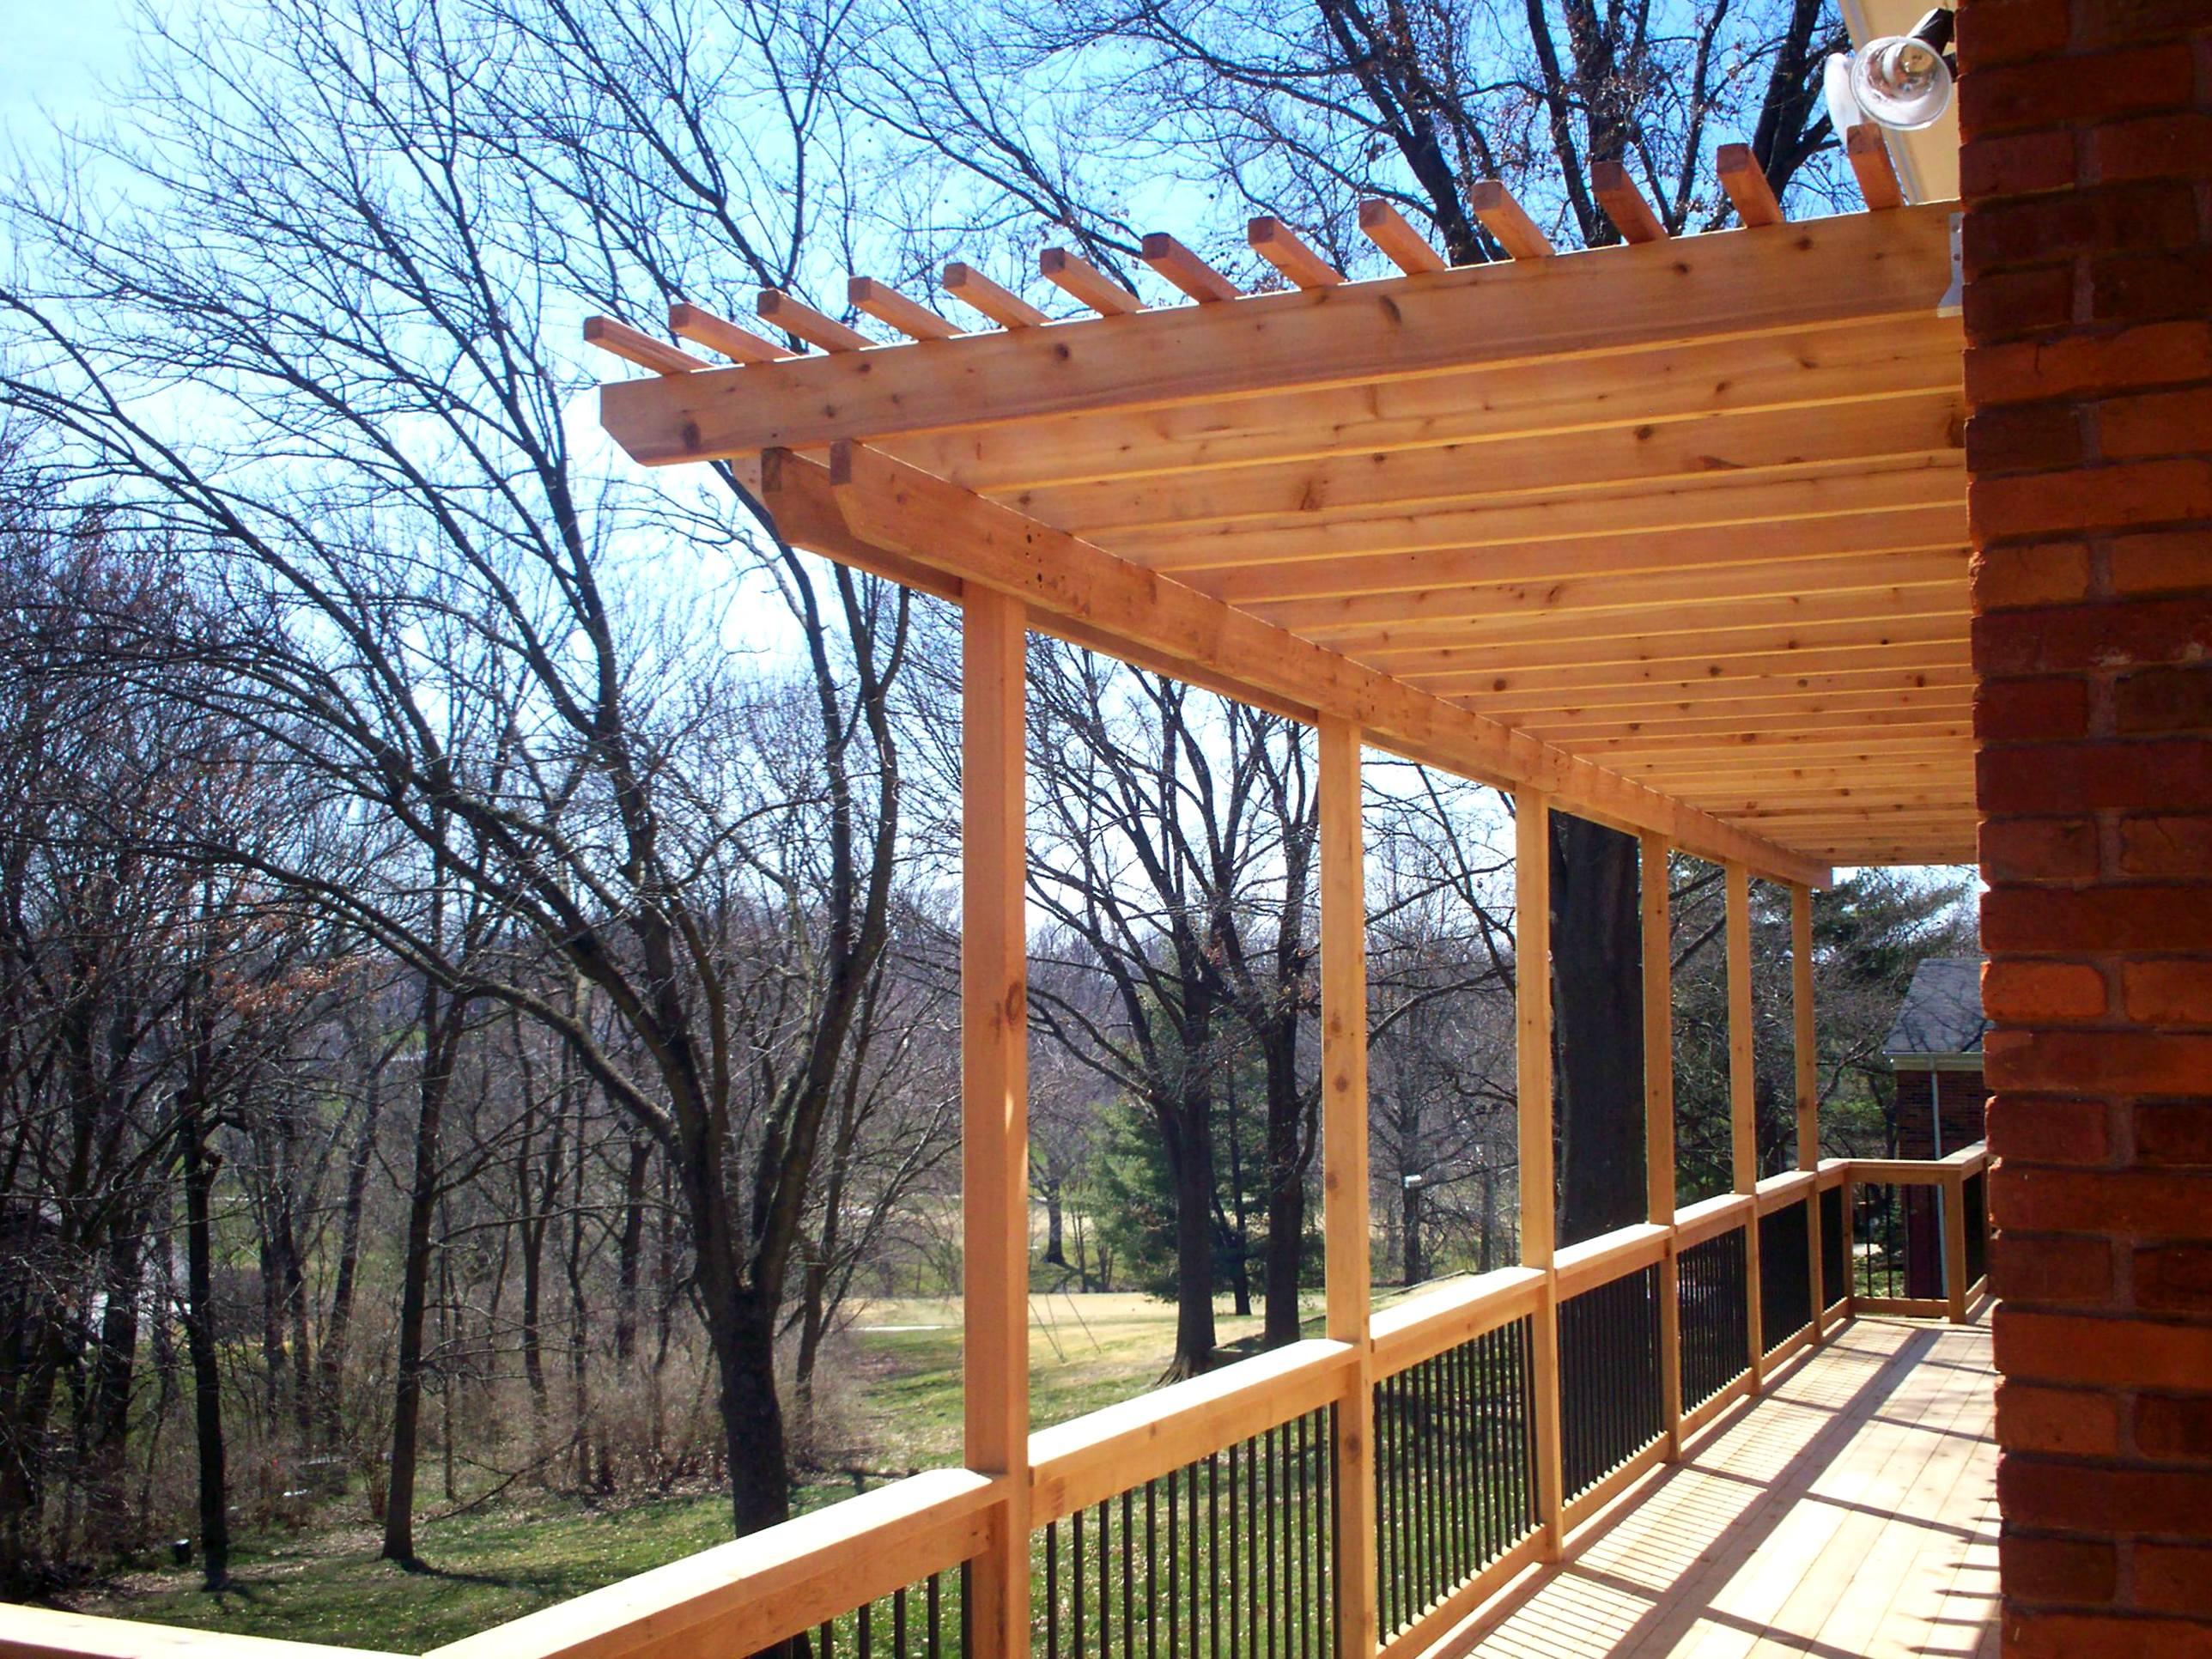 cedar decking | St. Louis decks, screened porches ... - photo#9